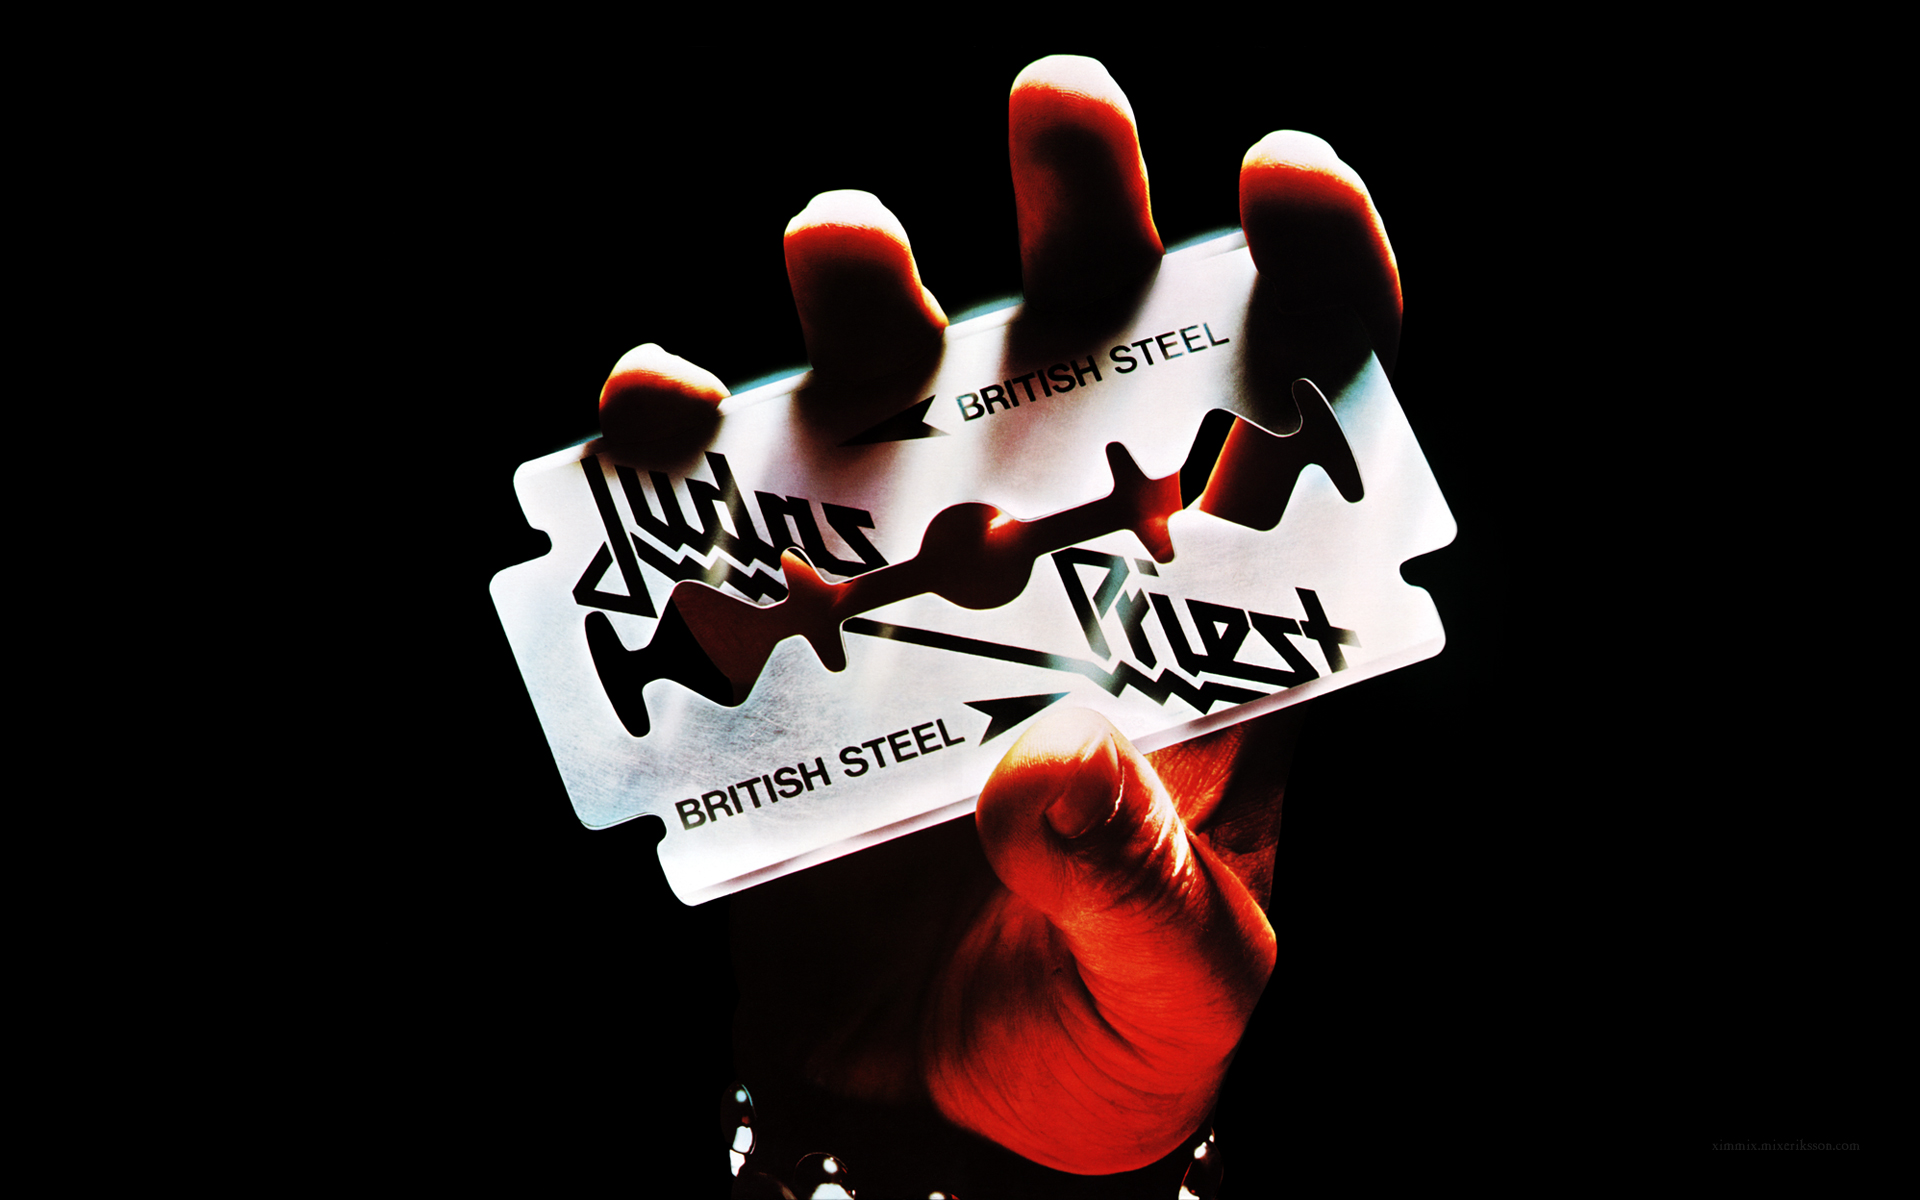 Heavy Metal Metal Hard Rock Classic Classic Rock Album Cover Wallpaper 1920x1200